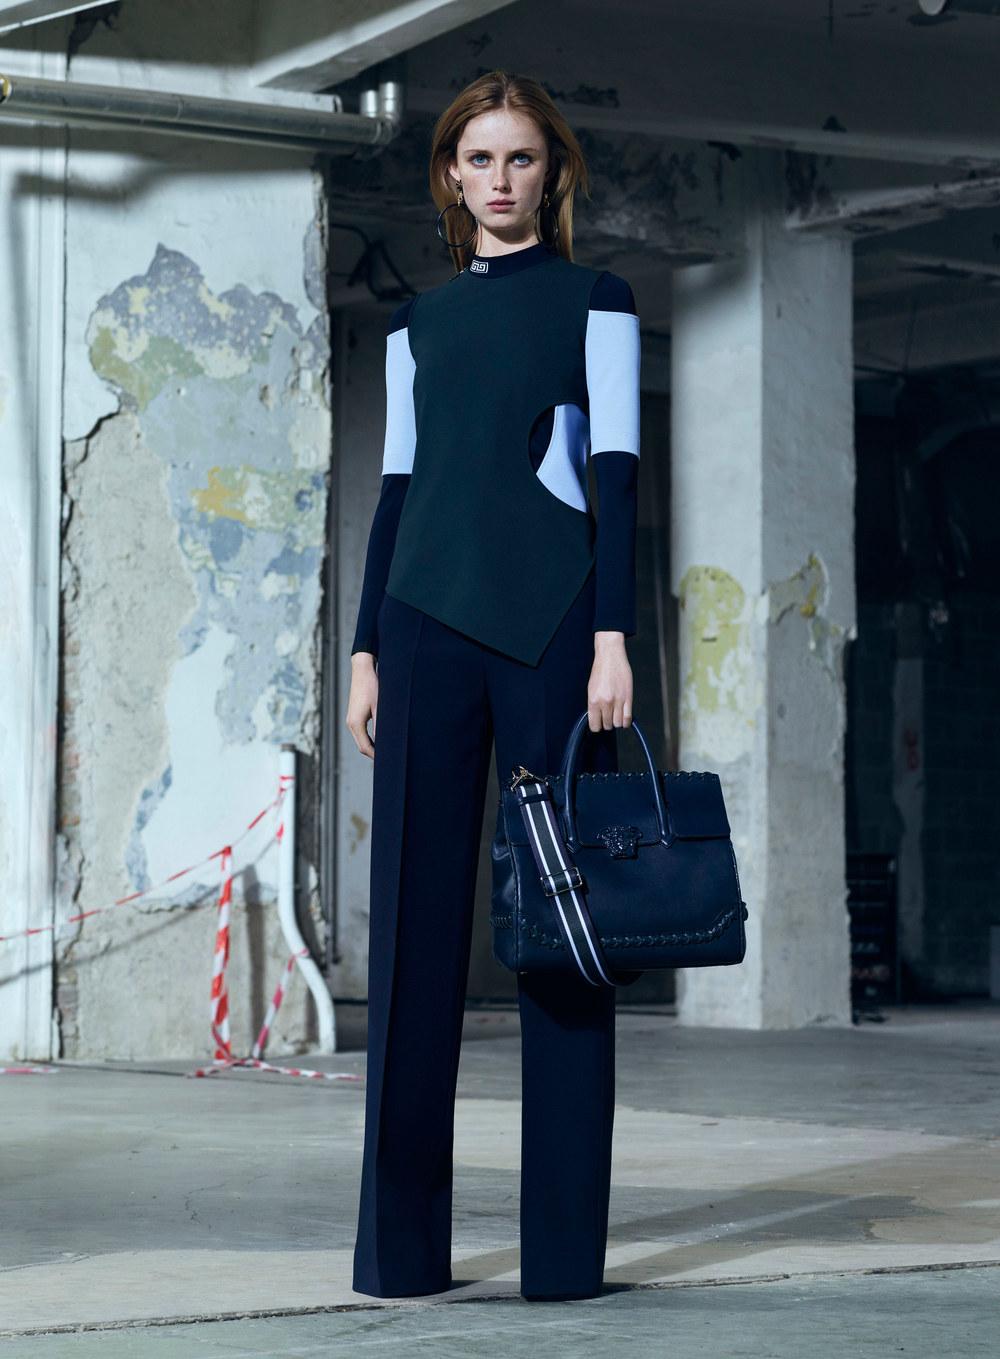 versace-pre-fall-2016-lookbook-12.jpg